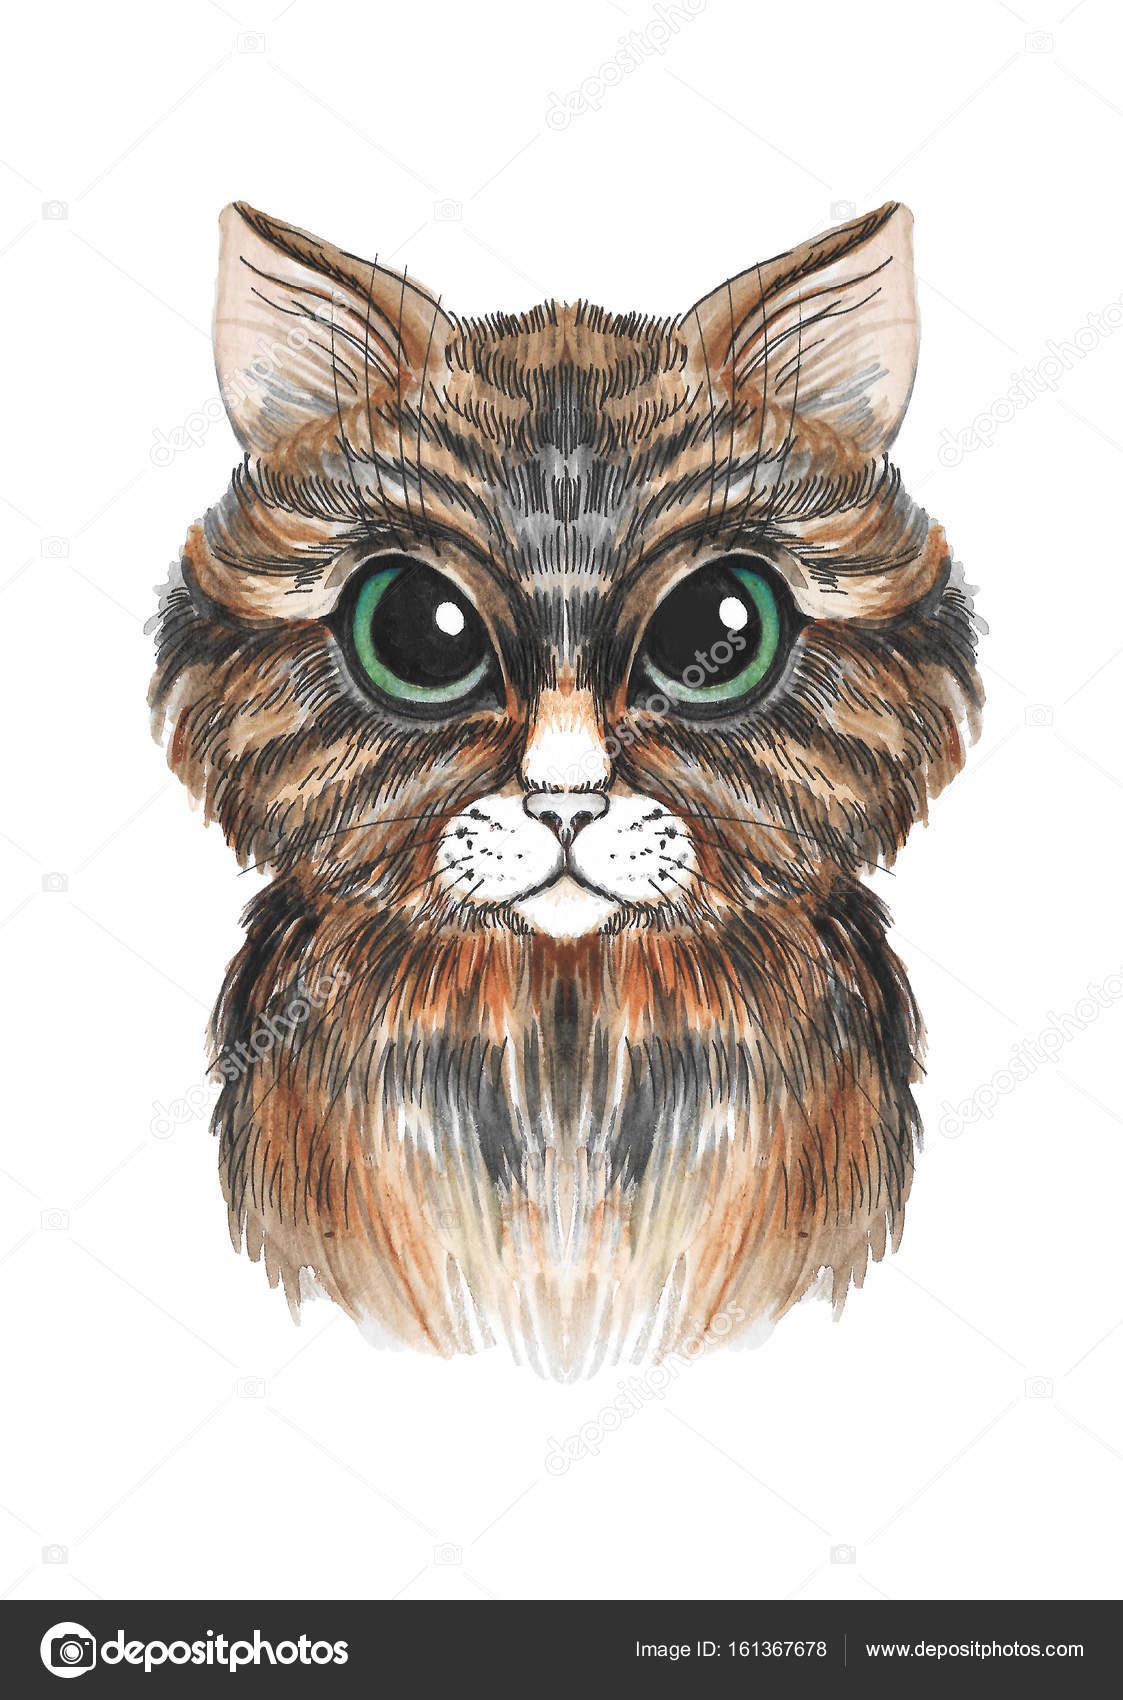 Süße Katze in Aquarell gemalt — Stockfoto © YuliaRey #161367678